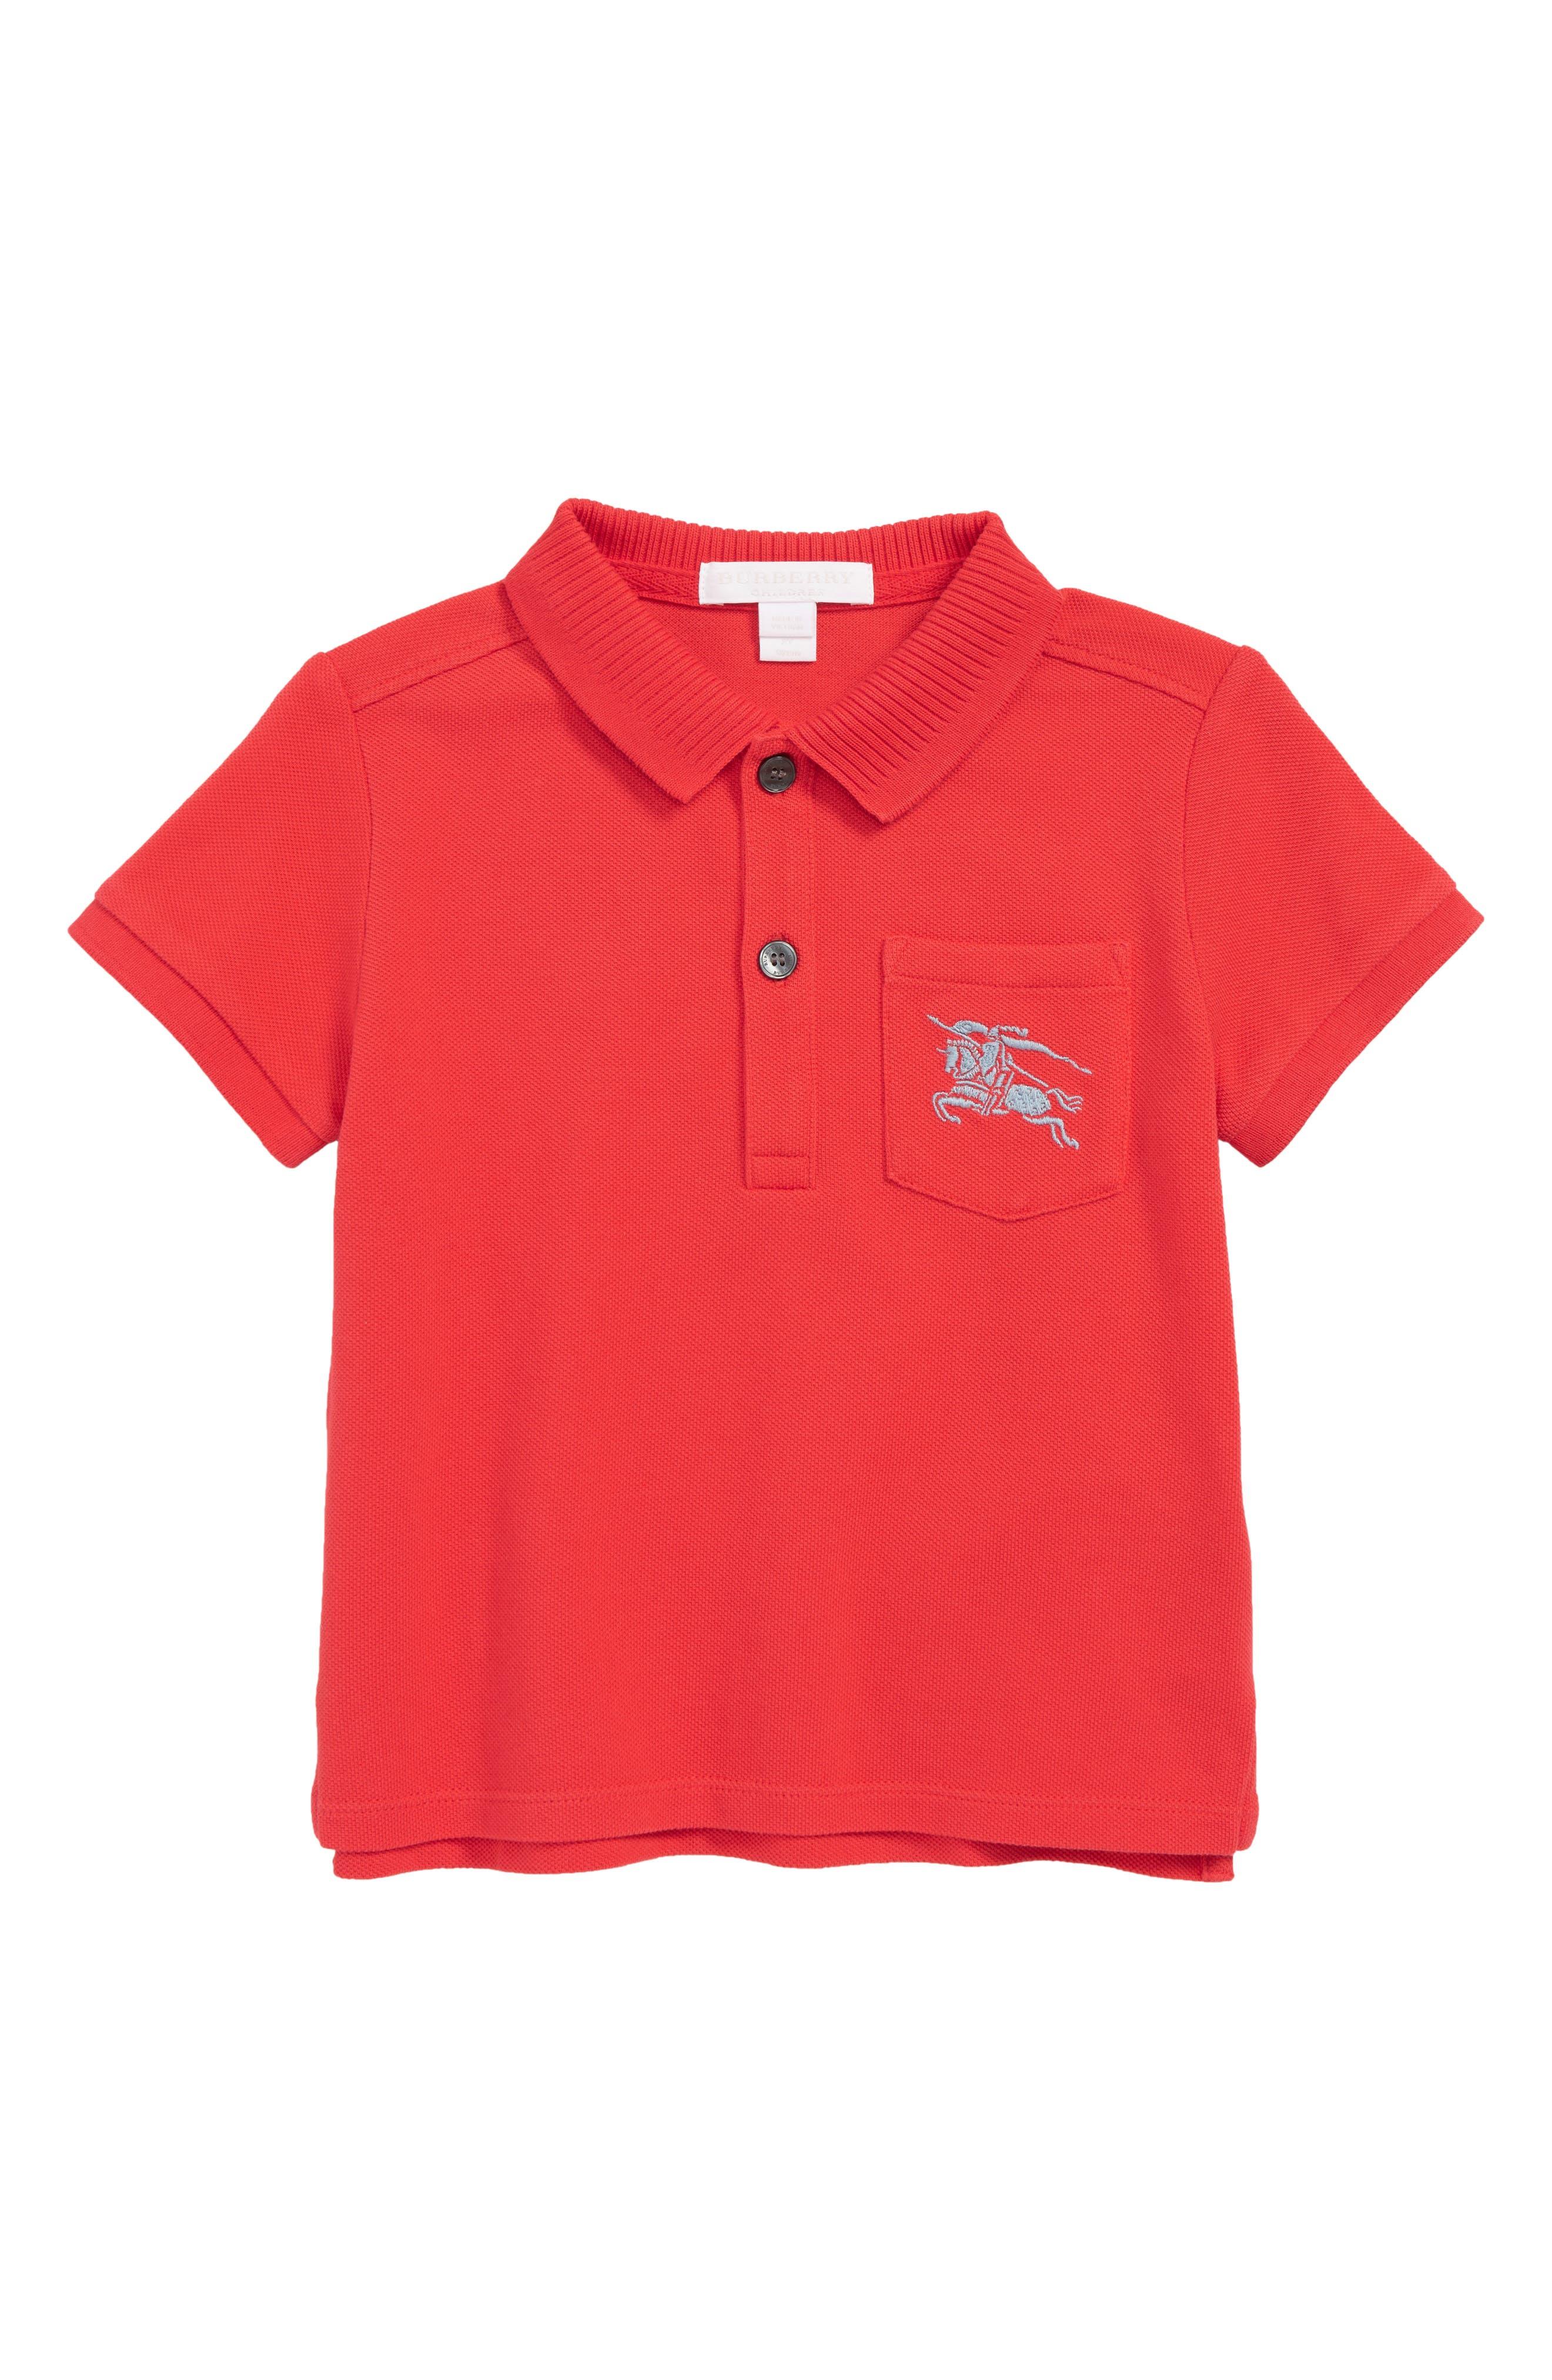 BURBERRY Grant Polo, Main, color, BRIGHT RED